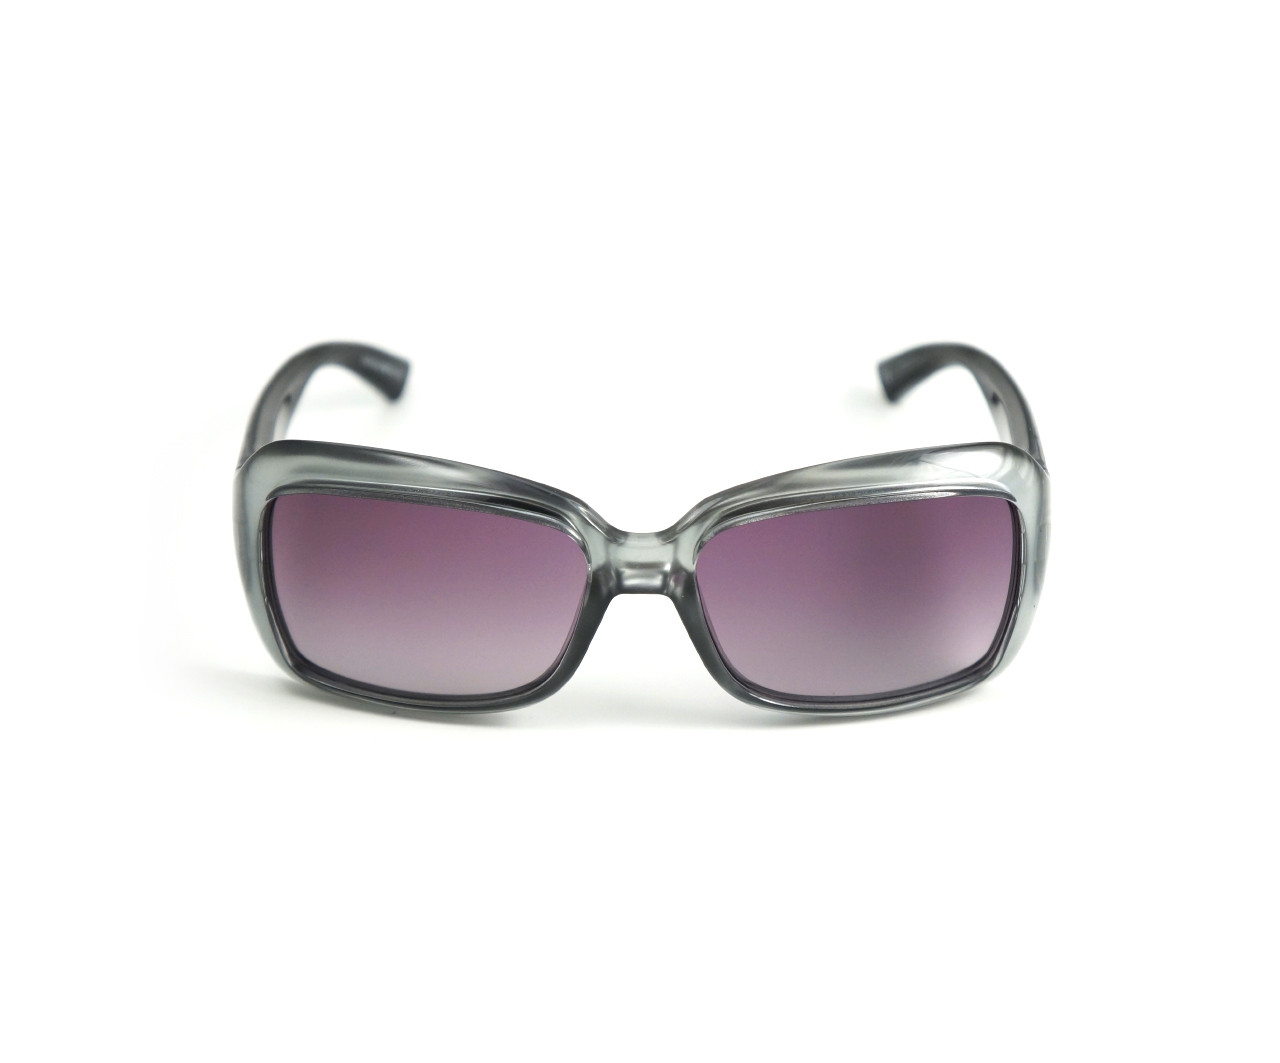 emporio-armani-ea-9455s-qgzn3-occhiale-vintage-7